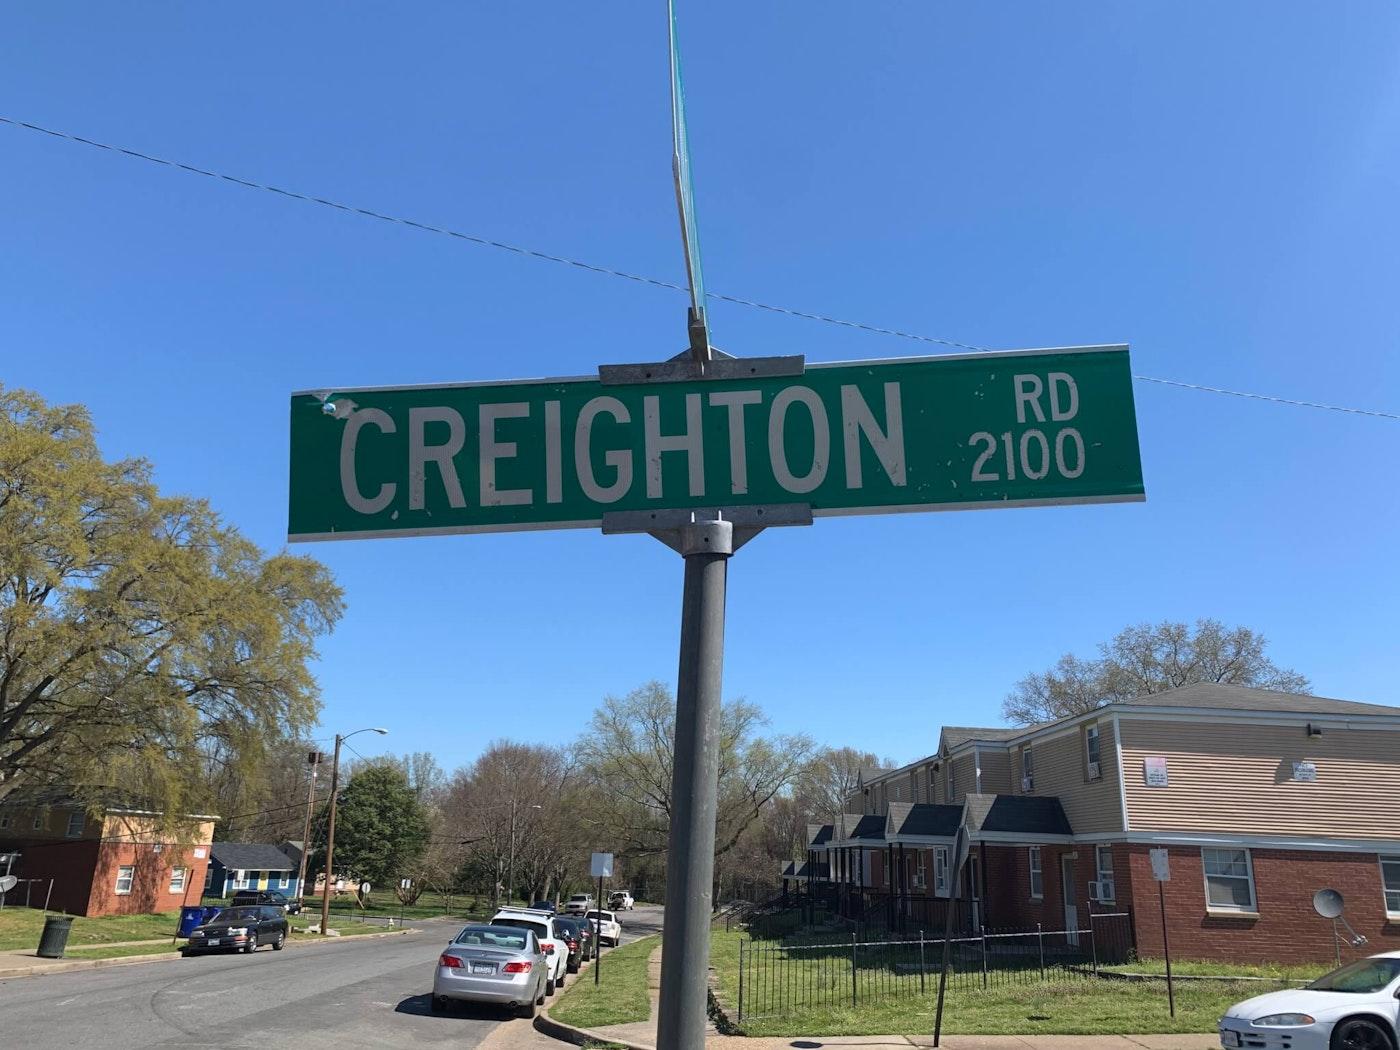 Creighton Rd.